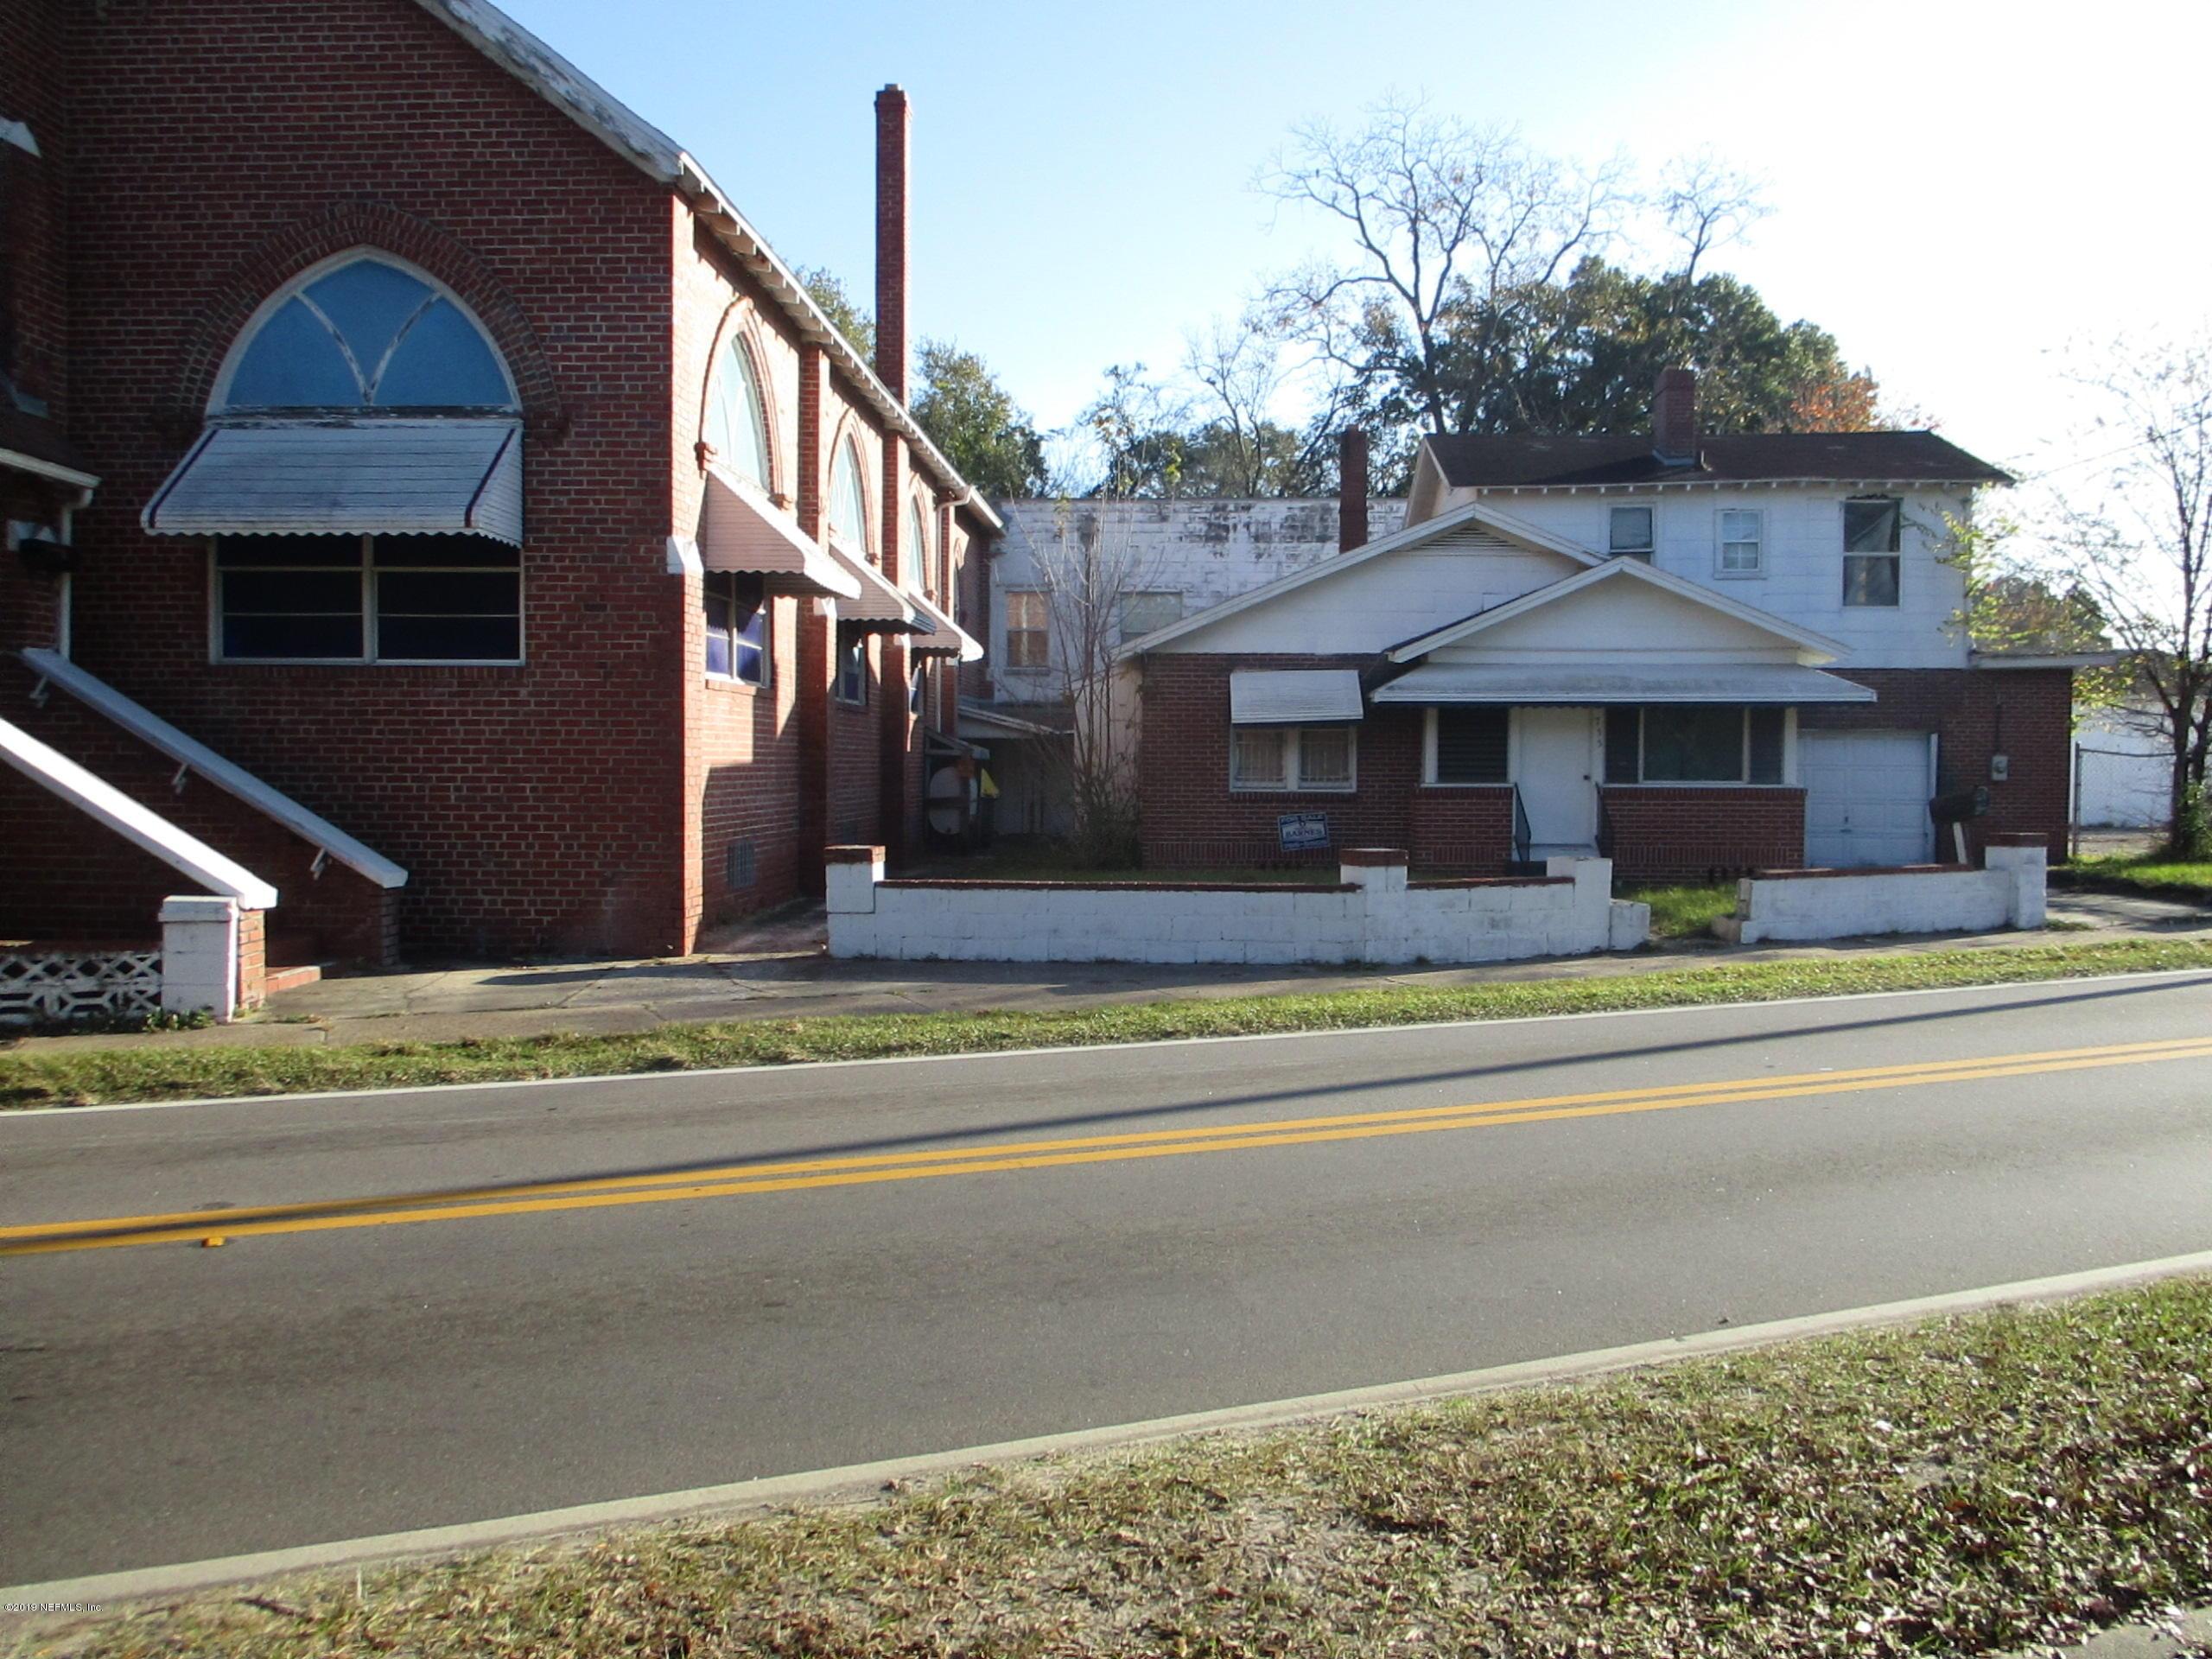 761 ACORN, JACKSONVILLE, FLORIDA 32209, ,Commercial,For sale,ACORN,1028553